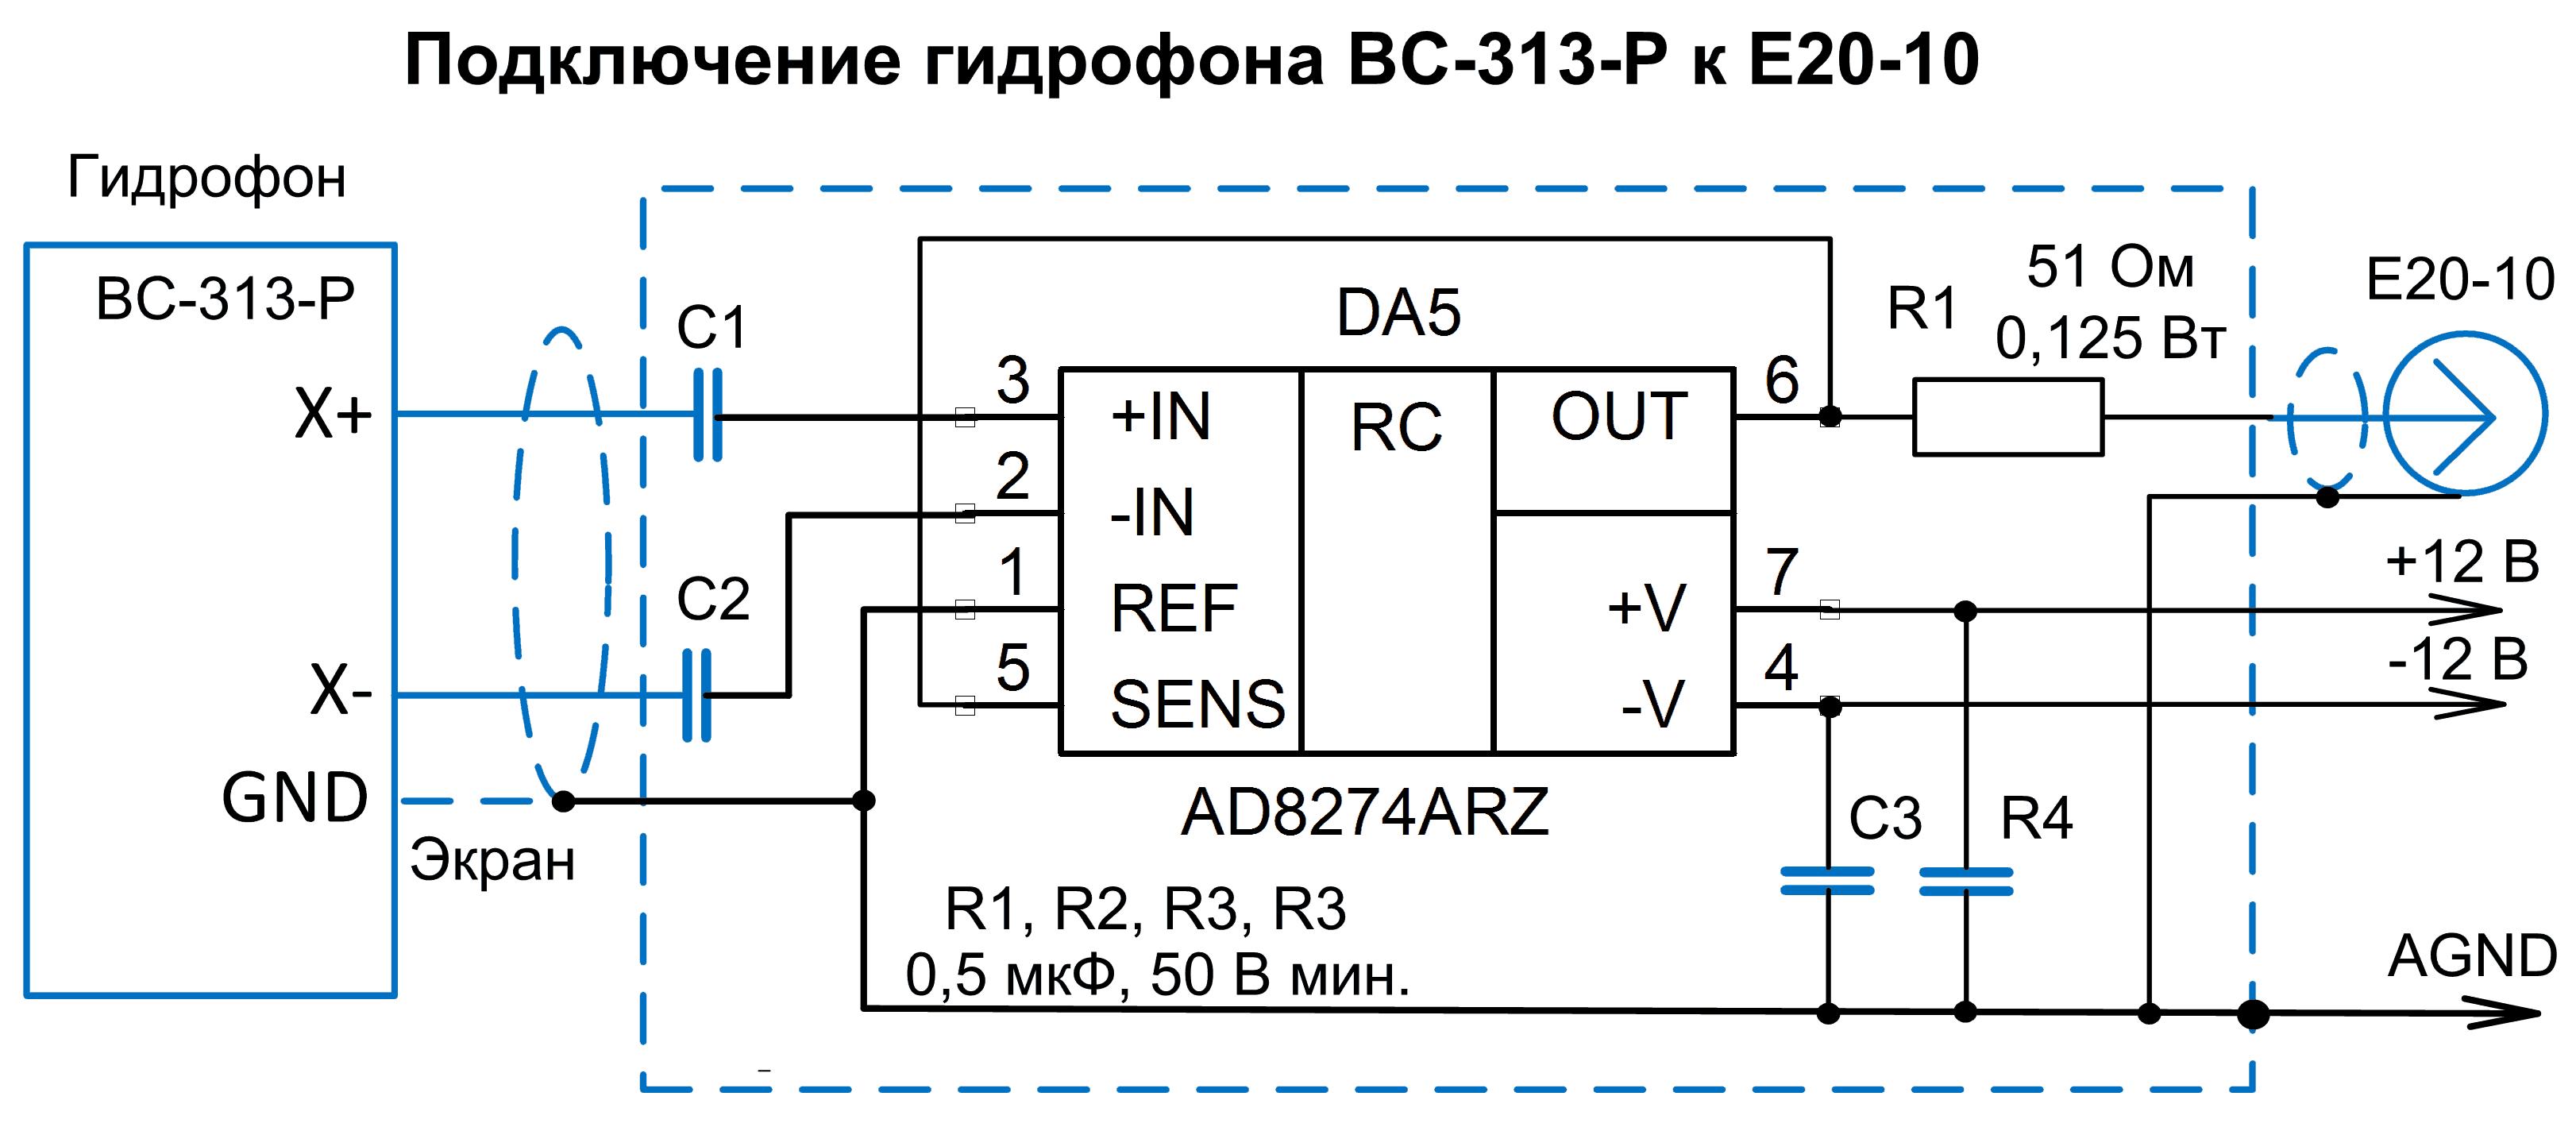 Подключение гидрофона к E20-10